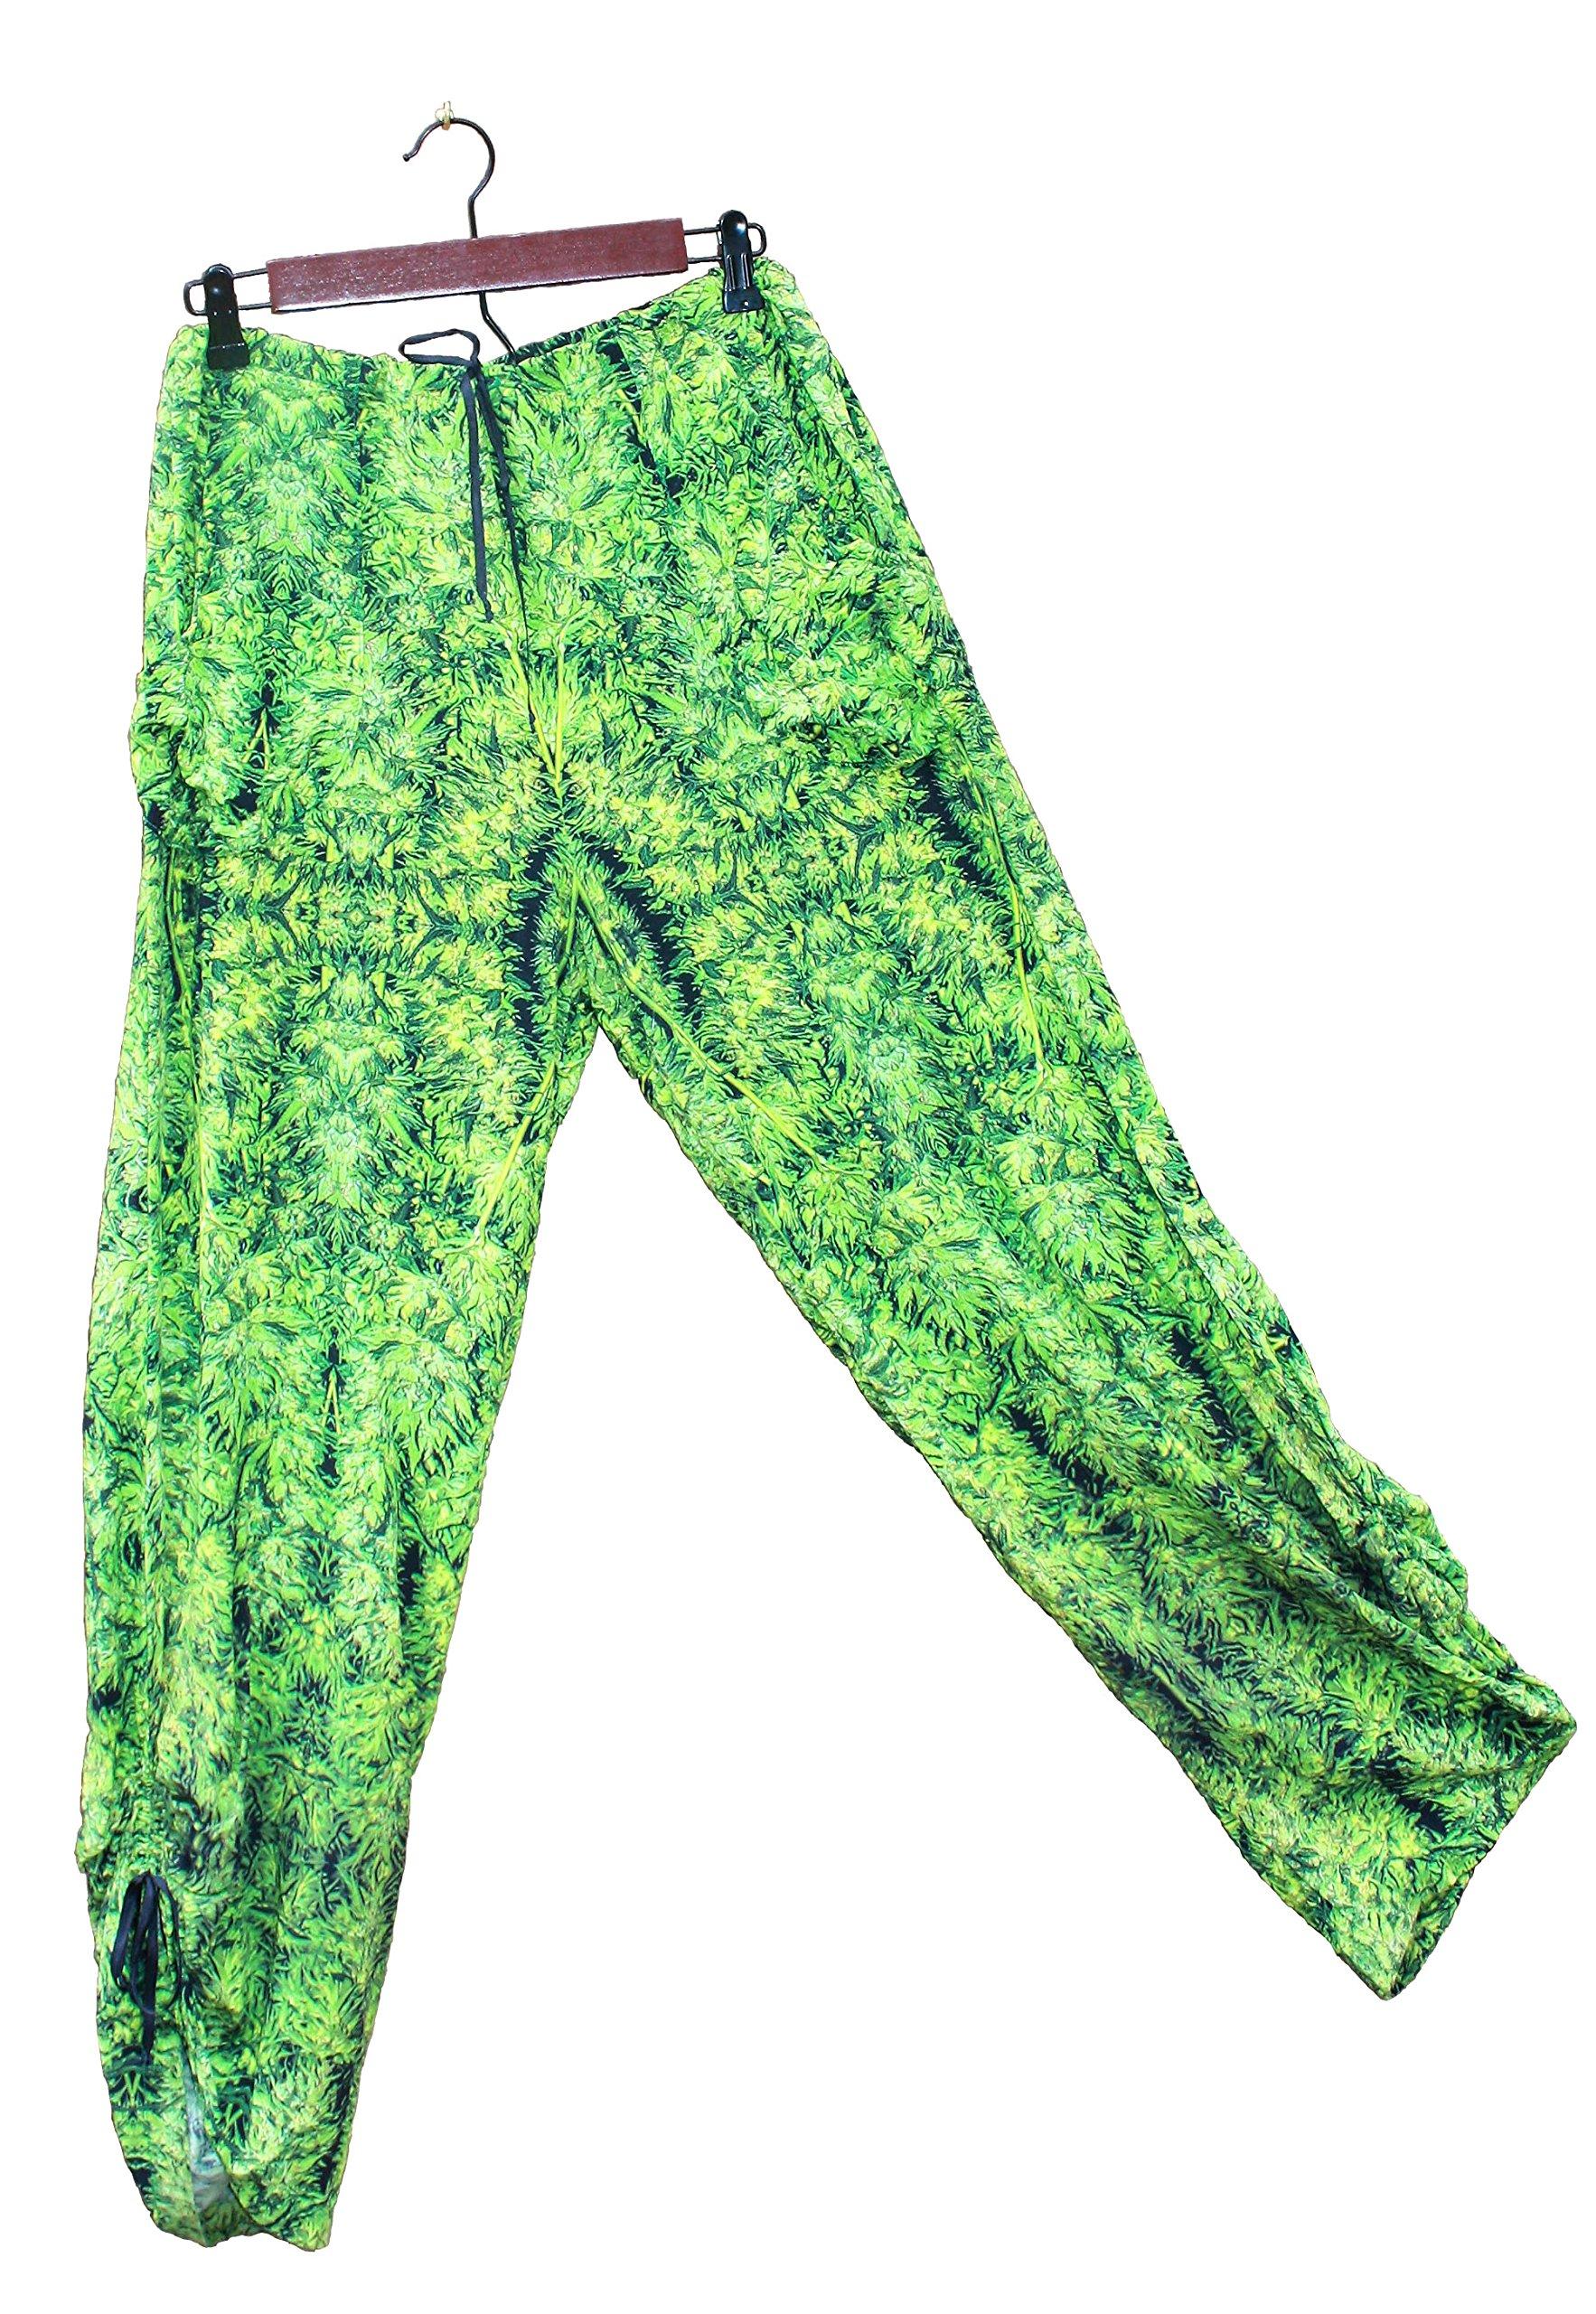 Hawaiian Floral Harem Pants Amnesia Kush Wedding Resort Beachwear XL/XXL